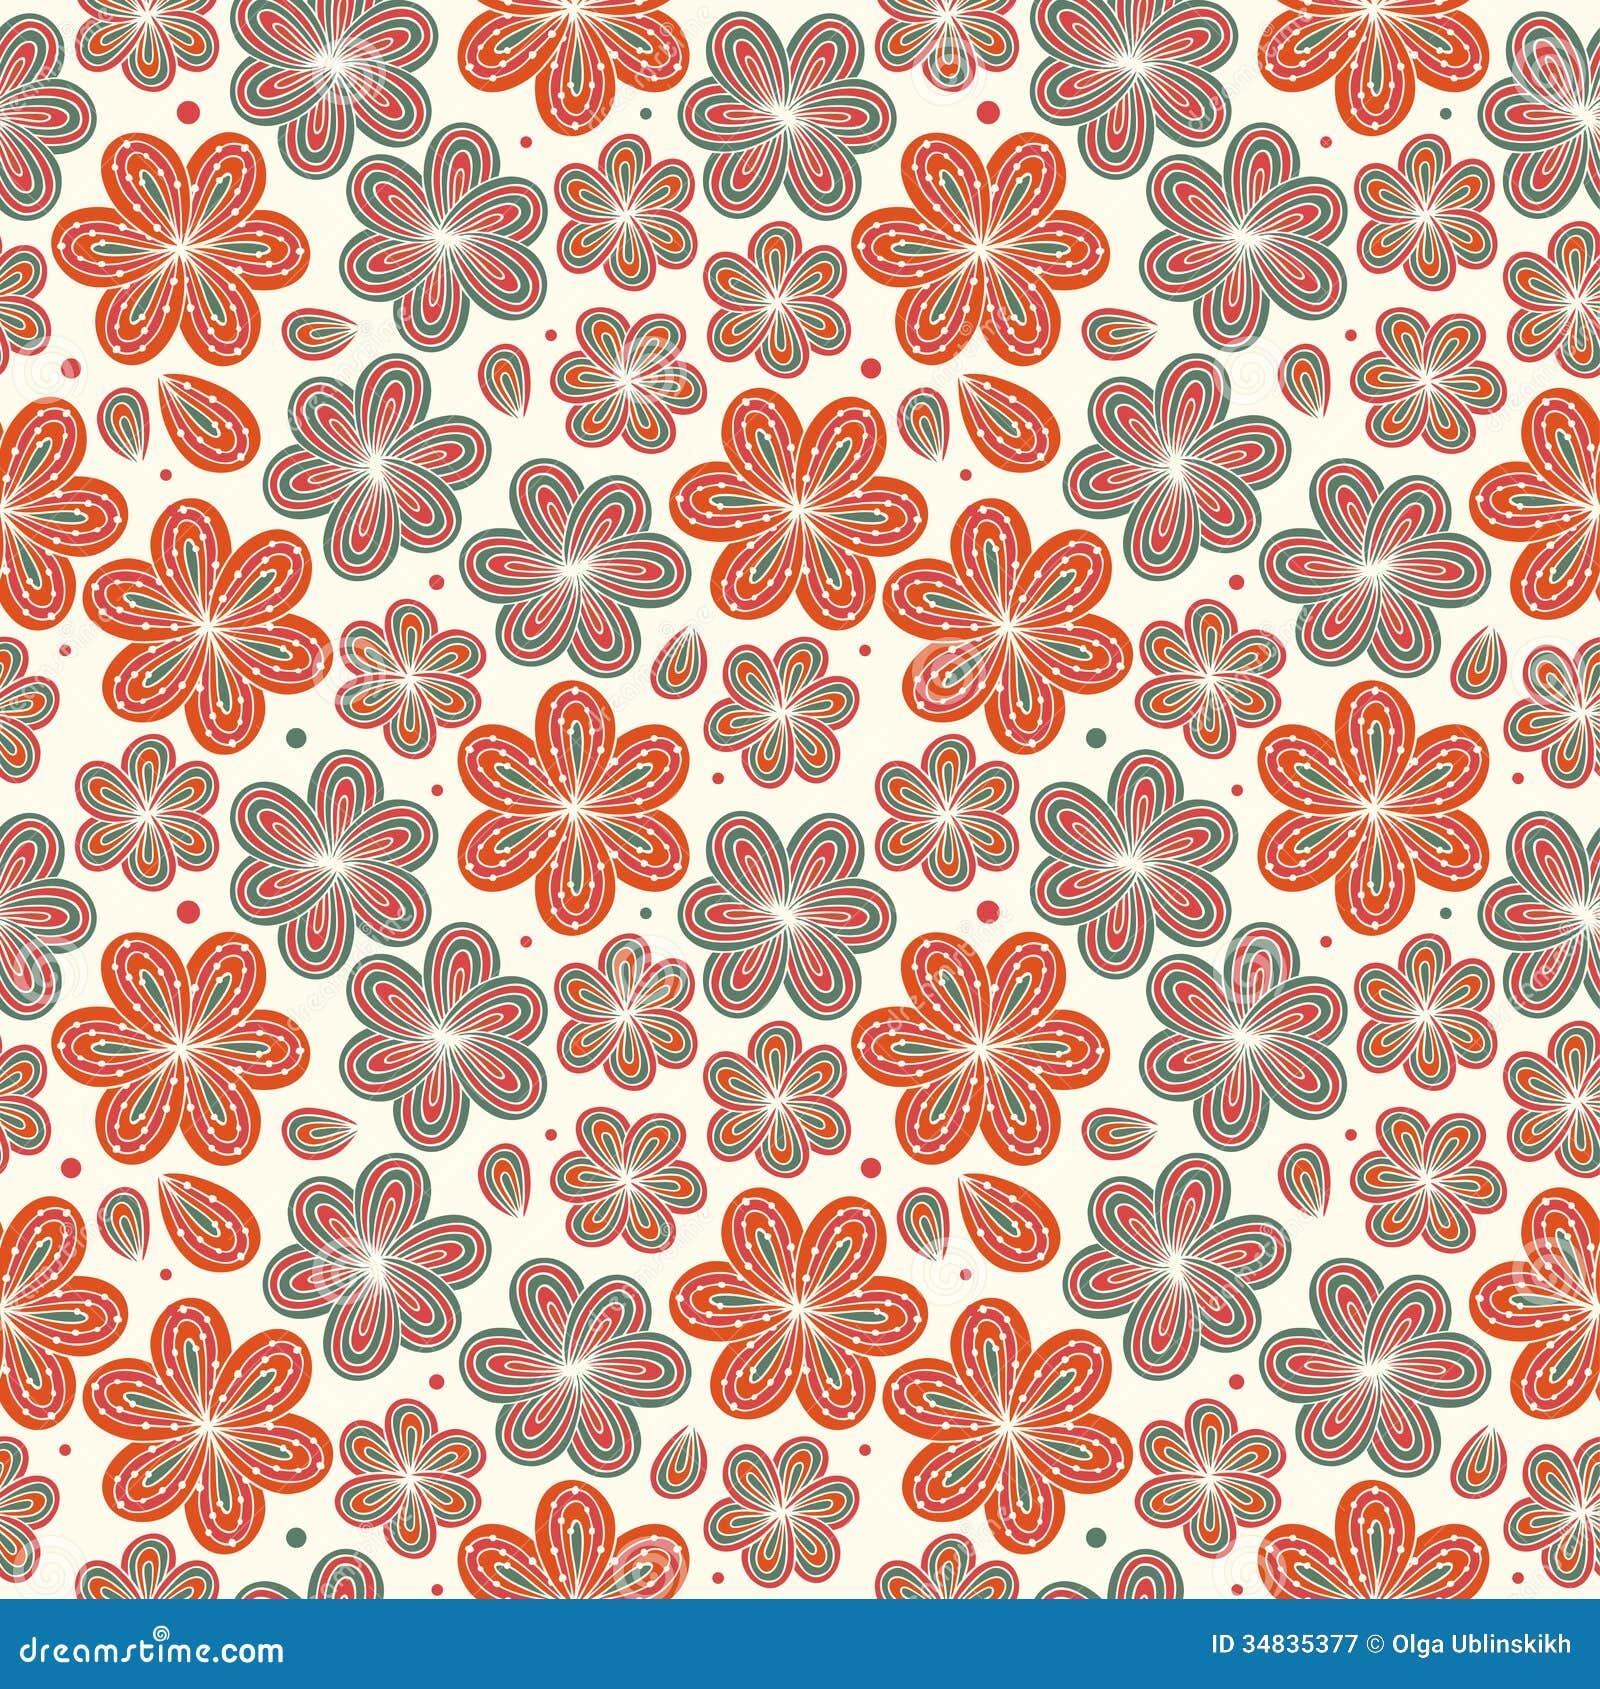 Floral Ornamental Seamless Pattern Decorative Nice Flowers